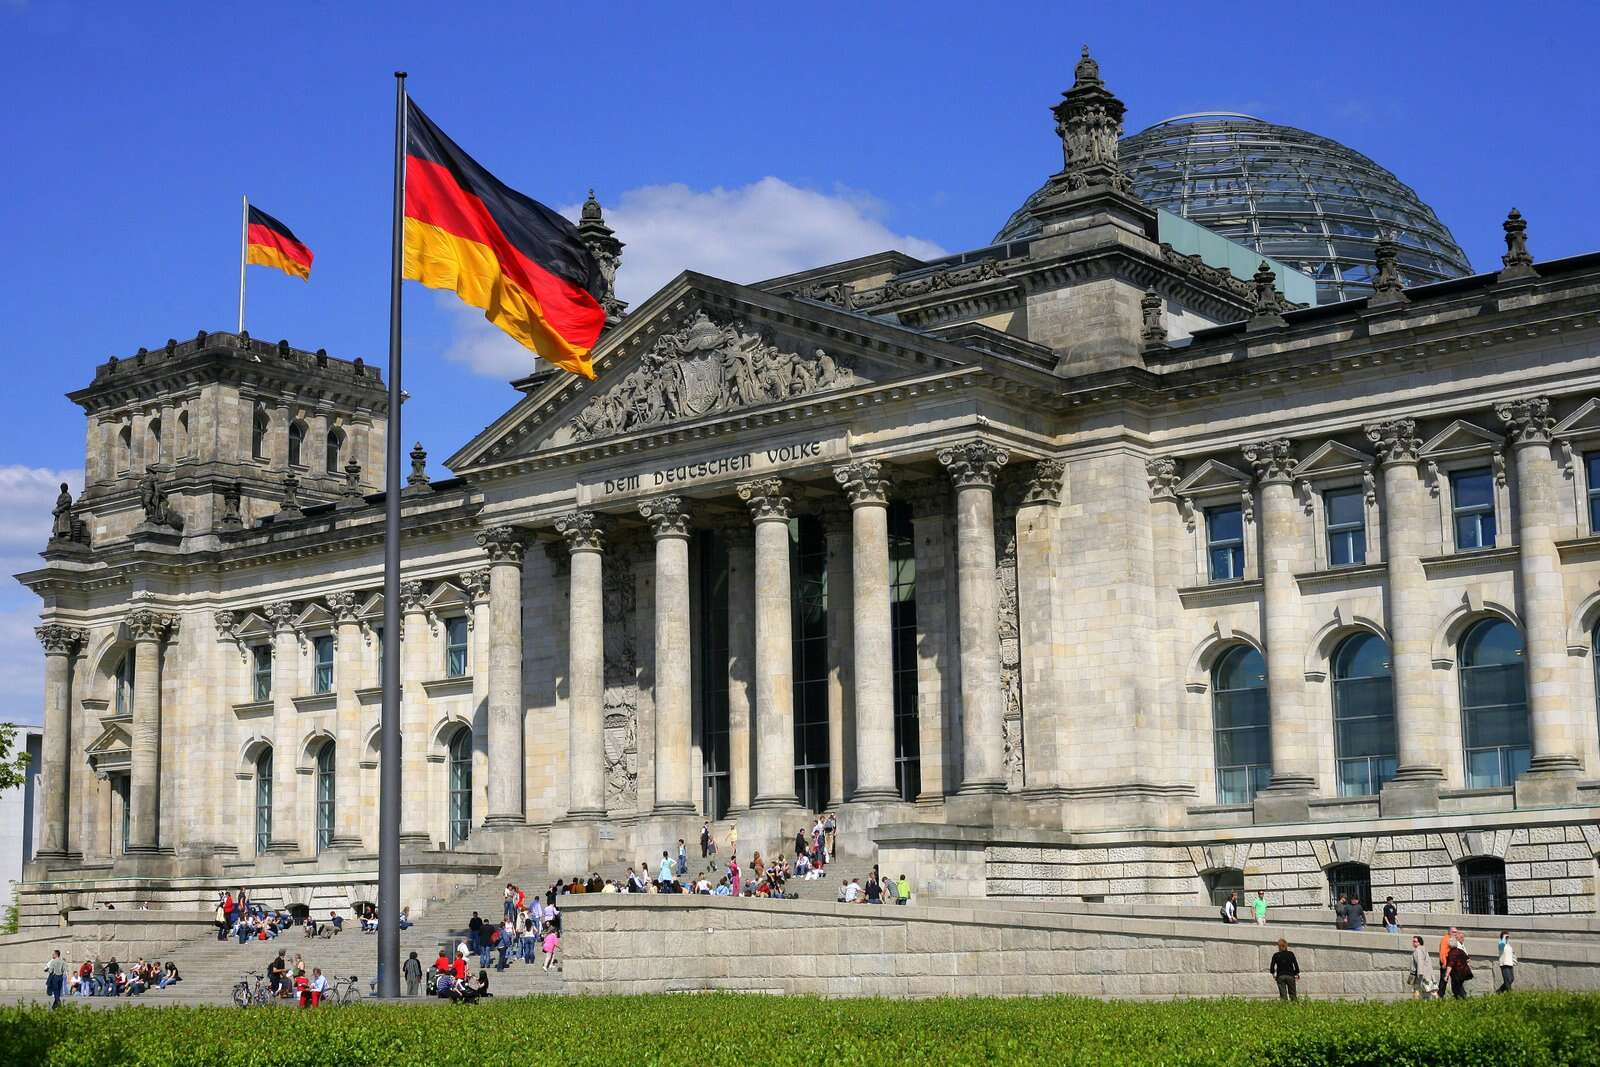 Evolution of architecture in Reichstag